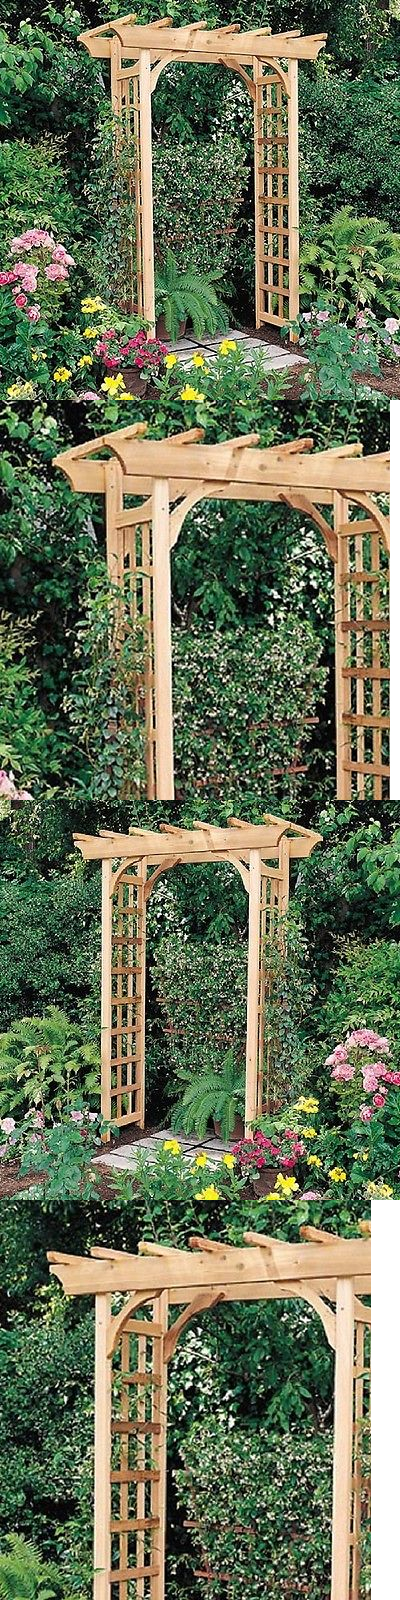 Pergolas 180996 Pergola Kits Wedding Arbor Garden Trellis Arches Free Standing Outdoor Cedar